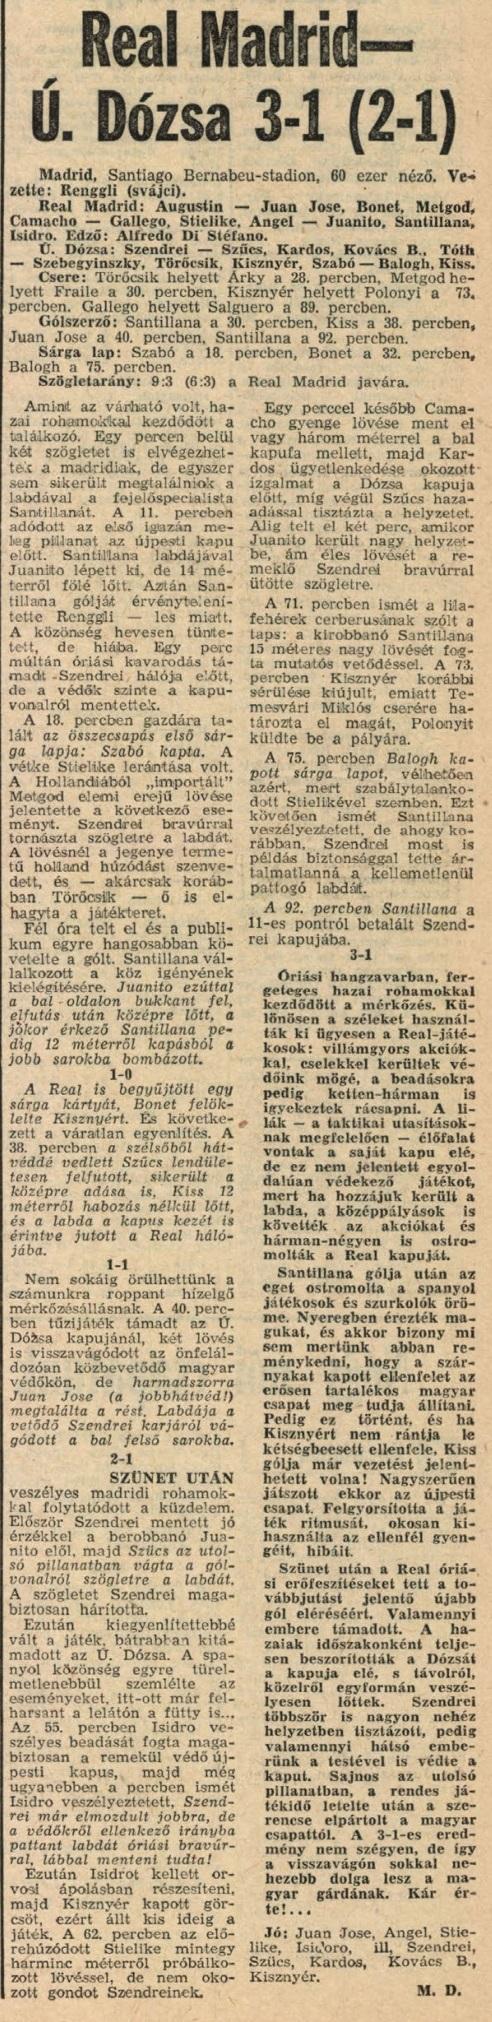 idokapszula_nb_i_1982_83_klubcsapataink_nemzetkozi_kupaszereplese_2_fordulo_1_kor_real_madrid_u_dozsa.jpg